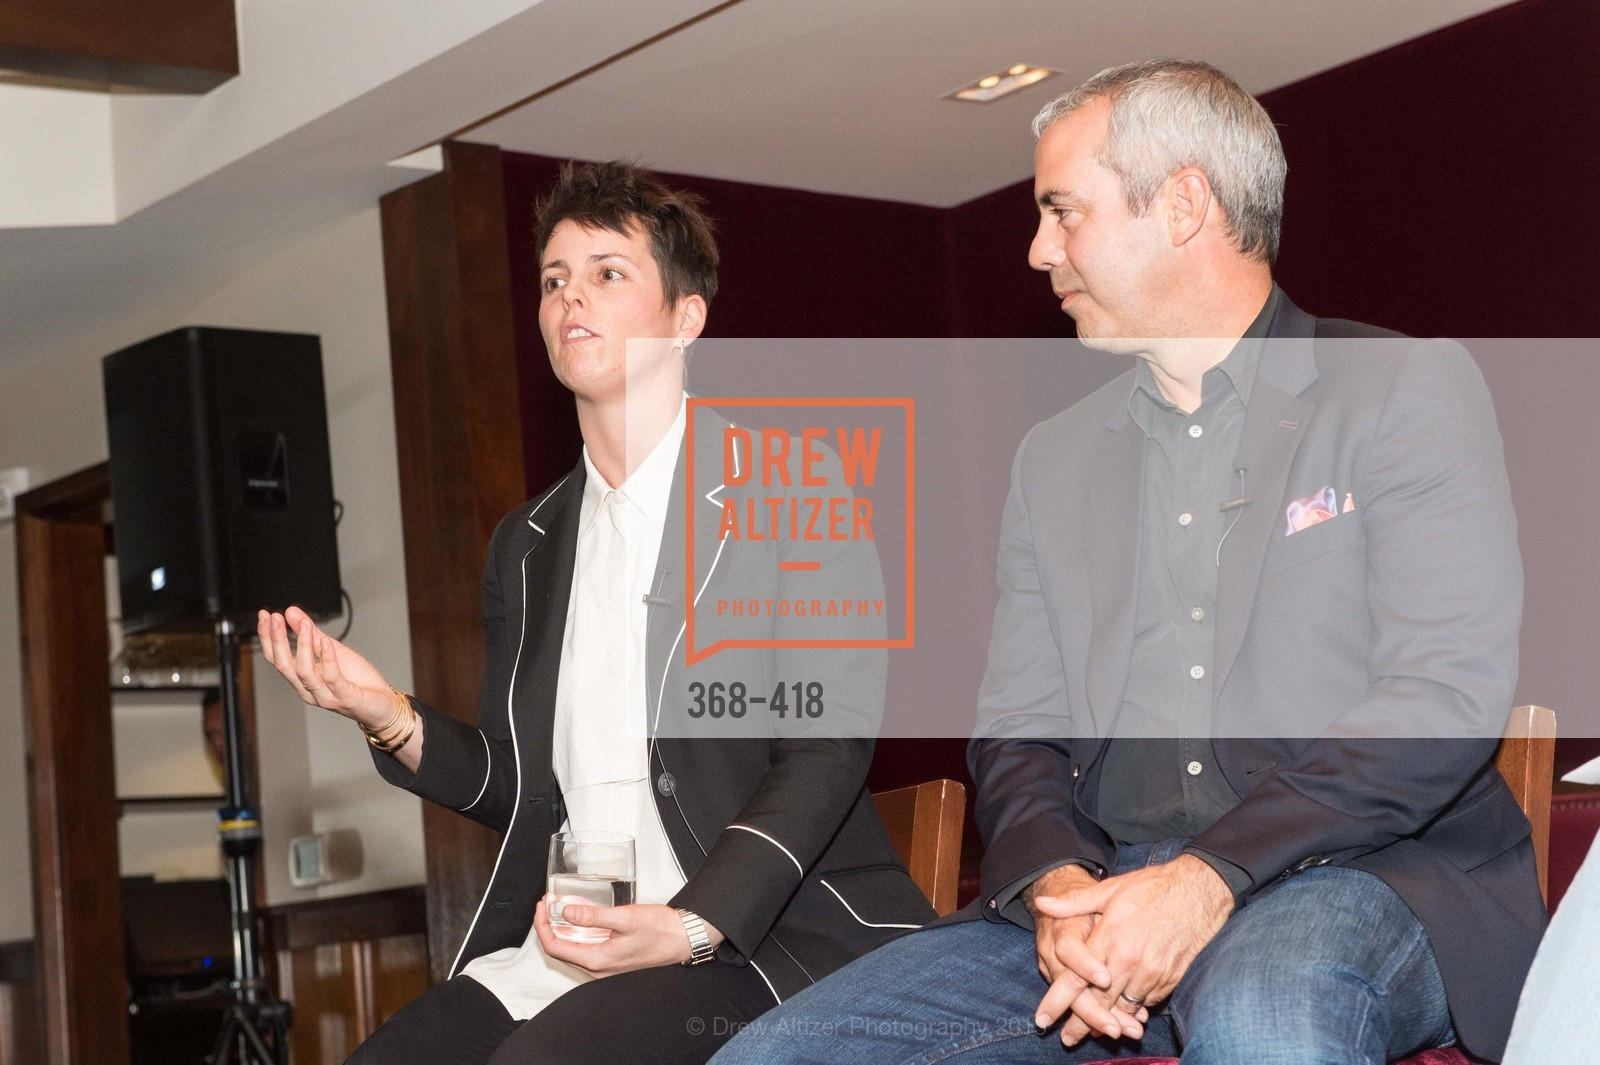 Jessica Silverman, Kevin Johnson, Artsy and Sotheby's Village Pub Dinner, Village Pub, October 27th, 2015